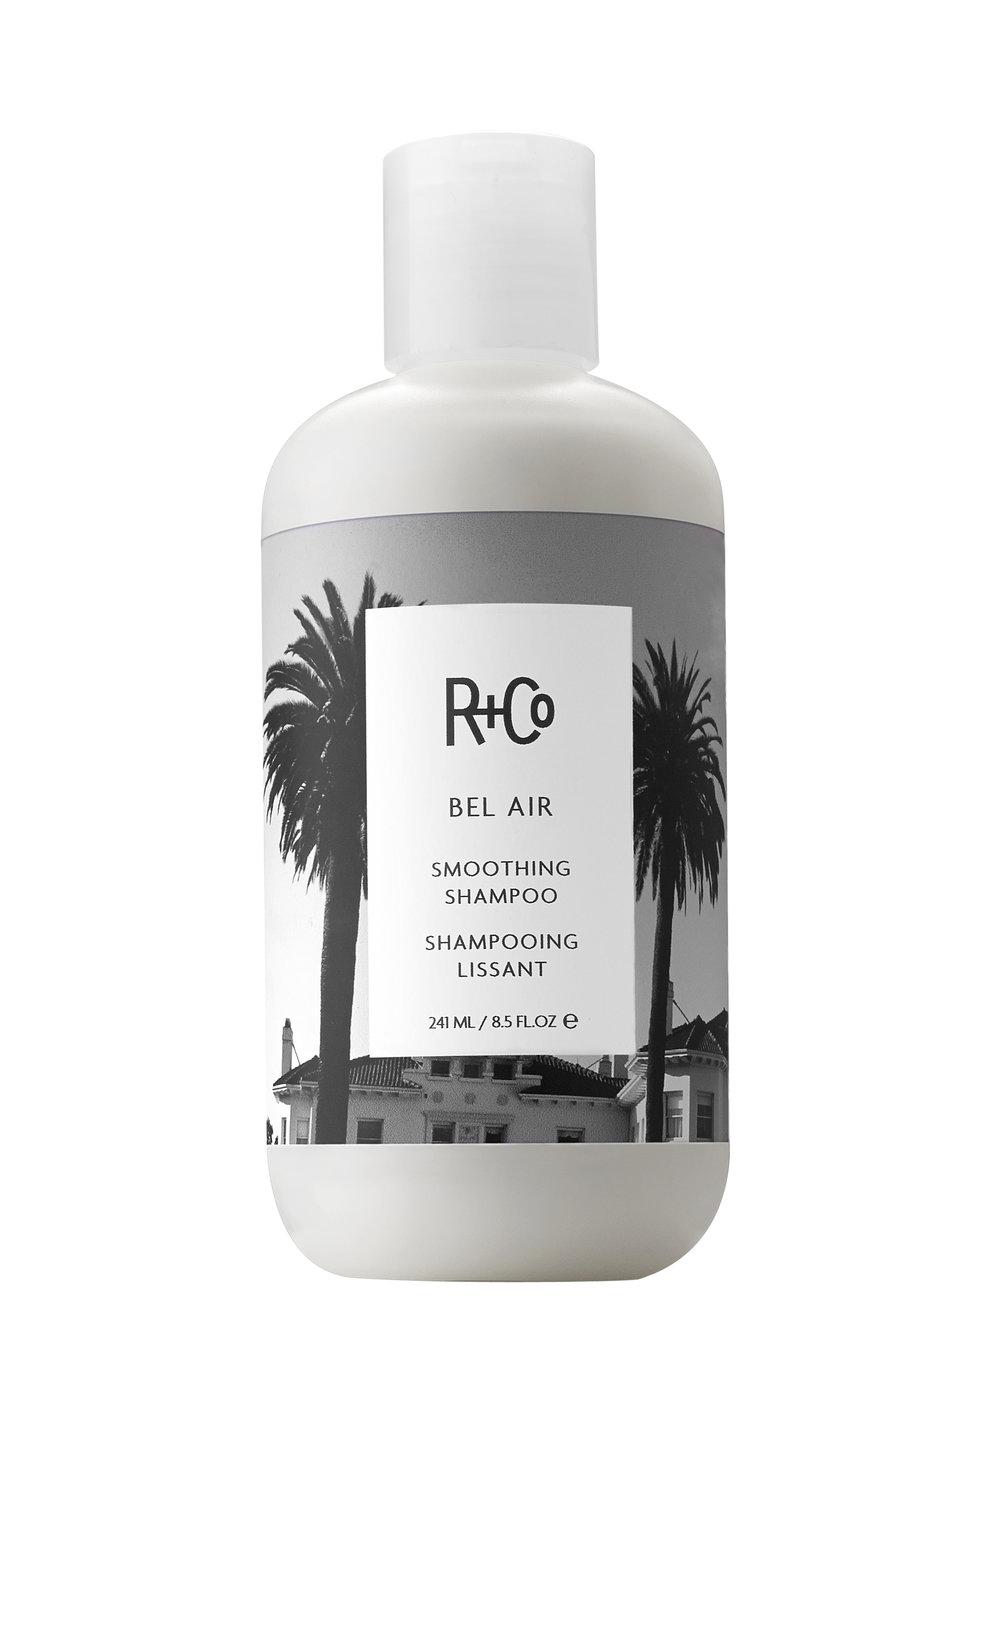 BEL AIR smoothing shampoo.jpg